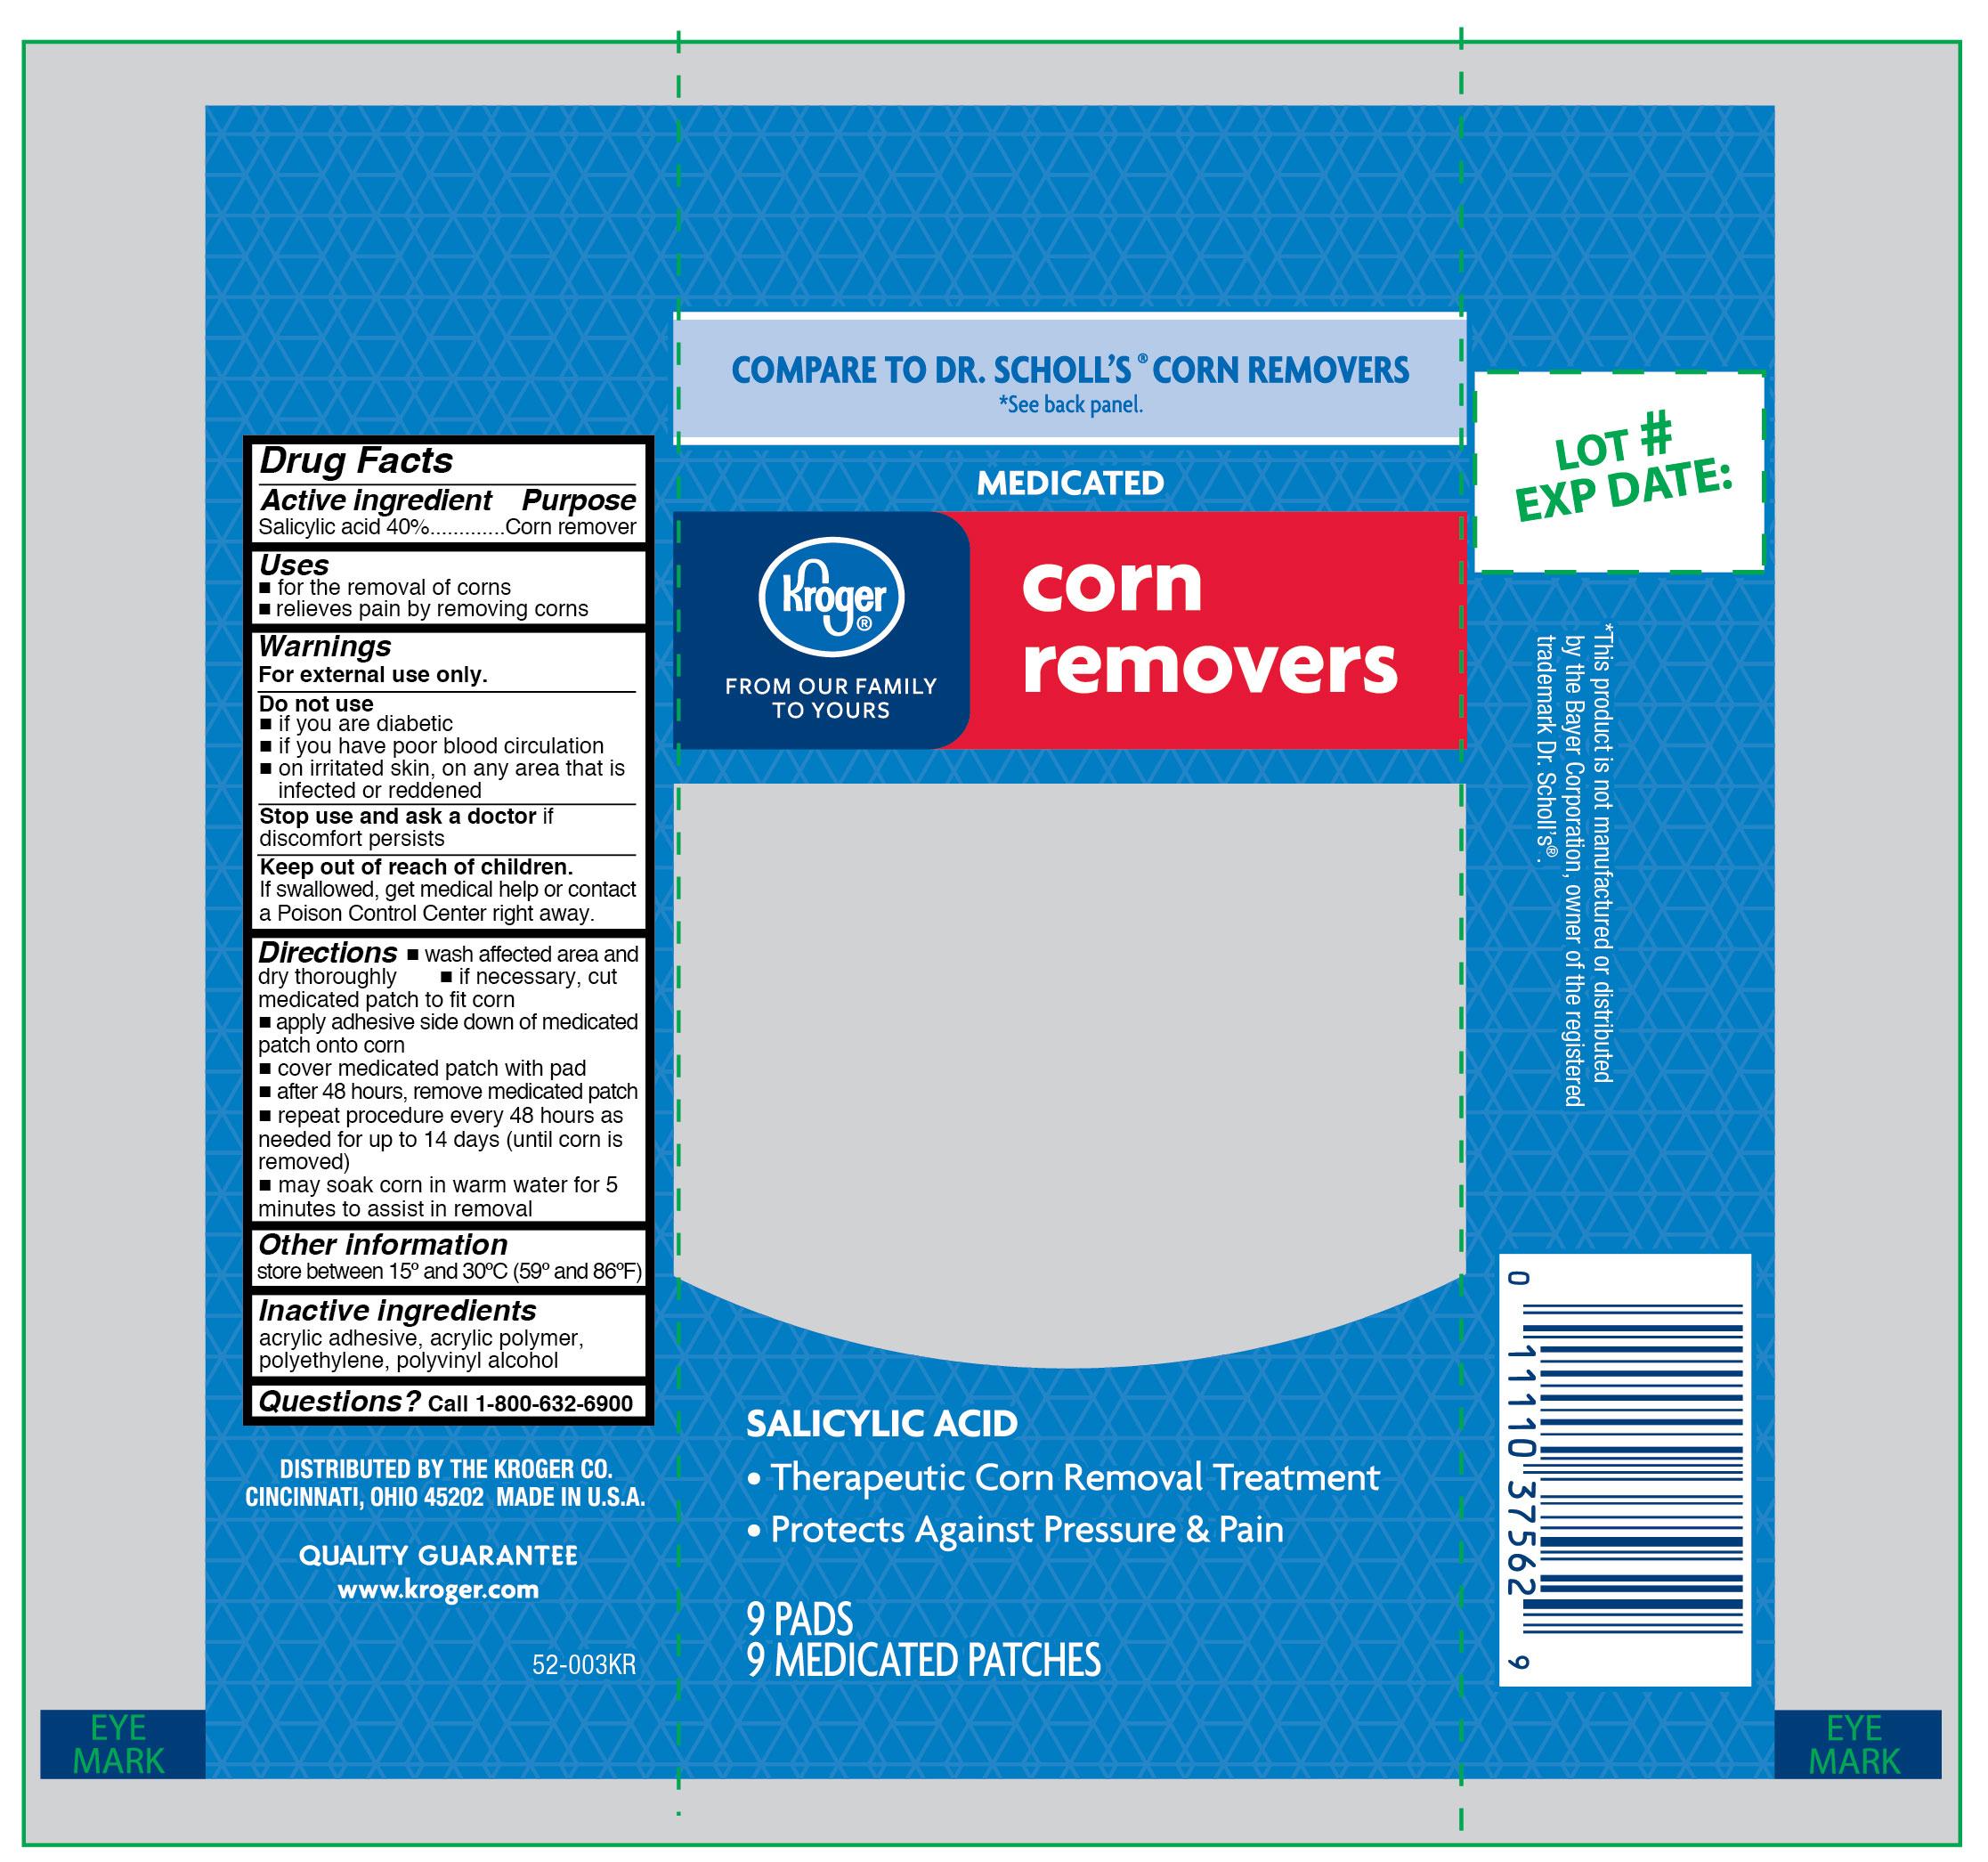 KROGER_Corn Removers.jpg